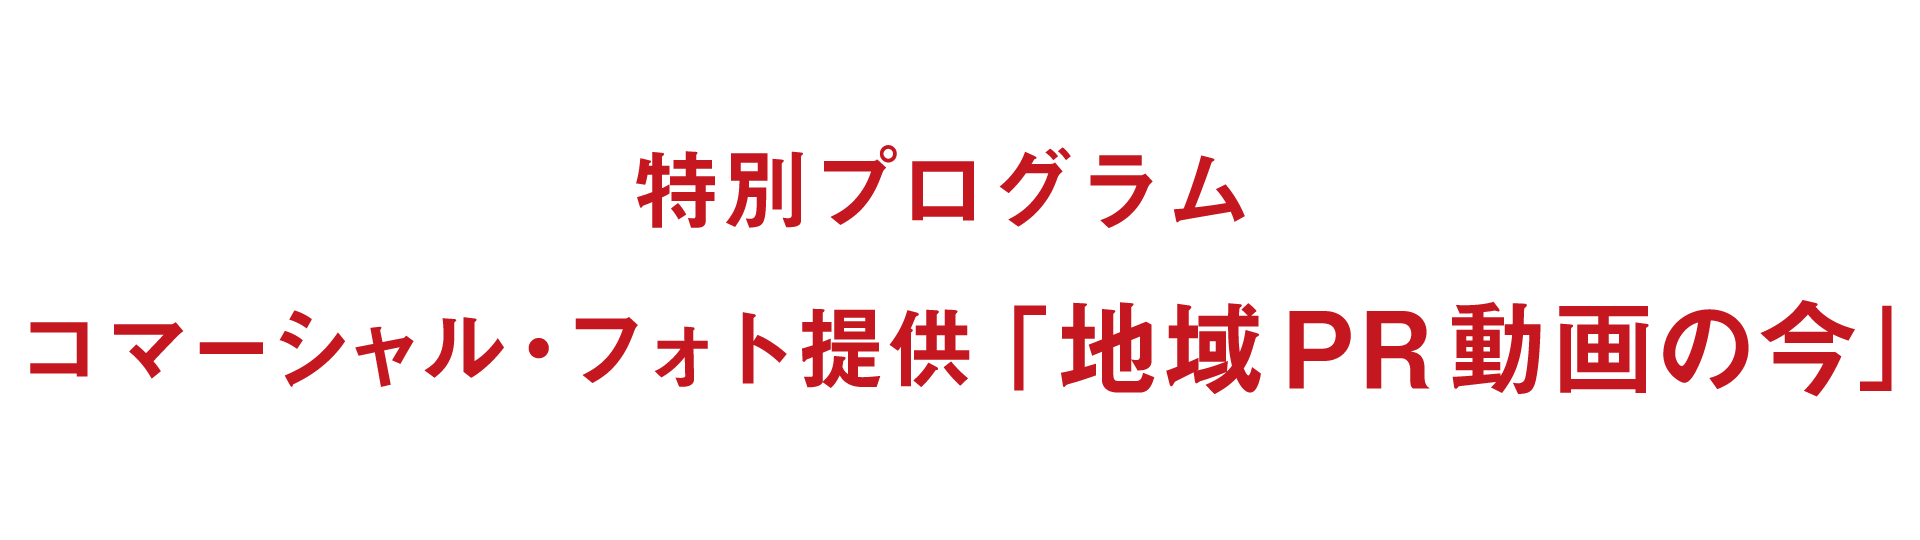 TIFF_2018_web_title_特別プログラム.png